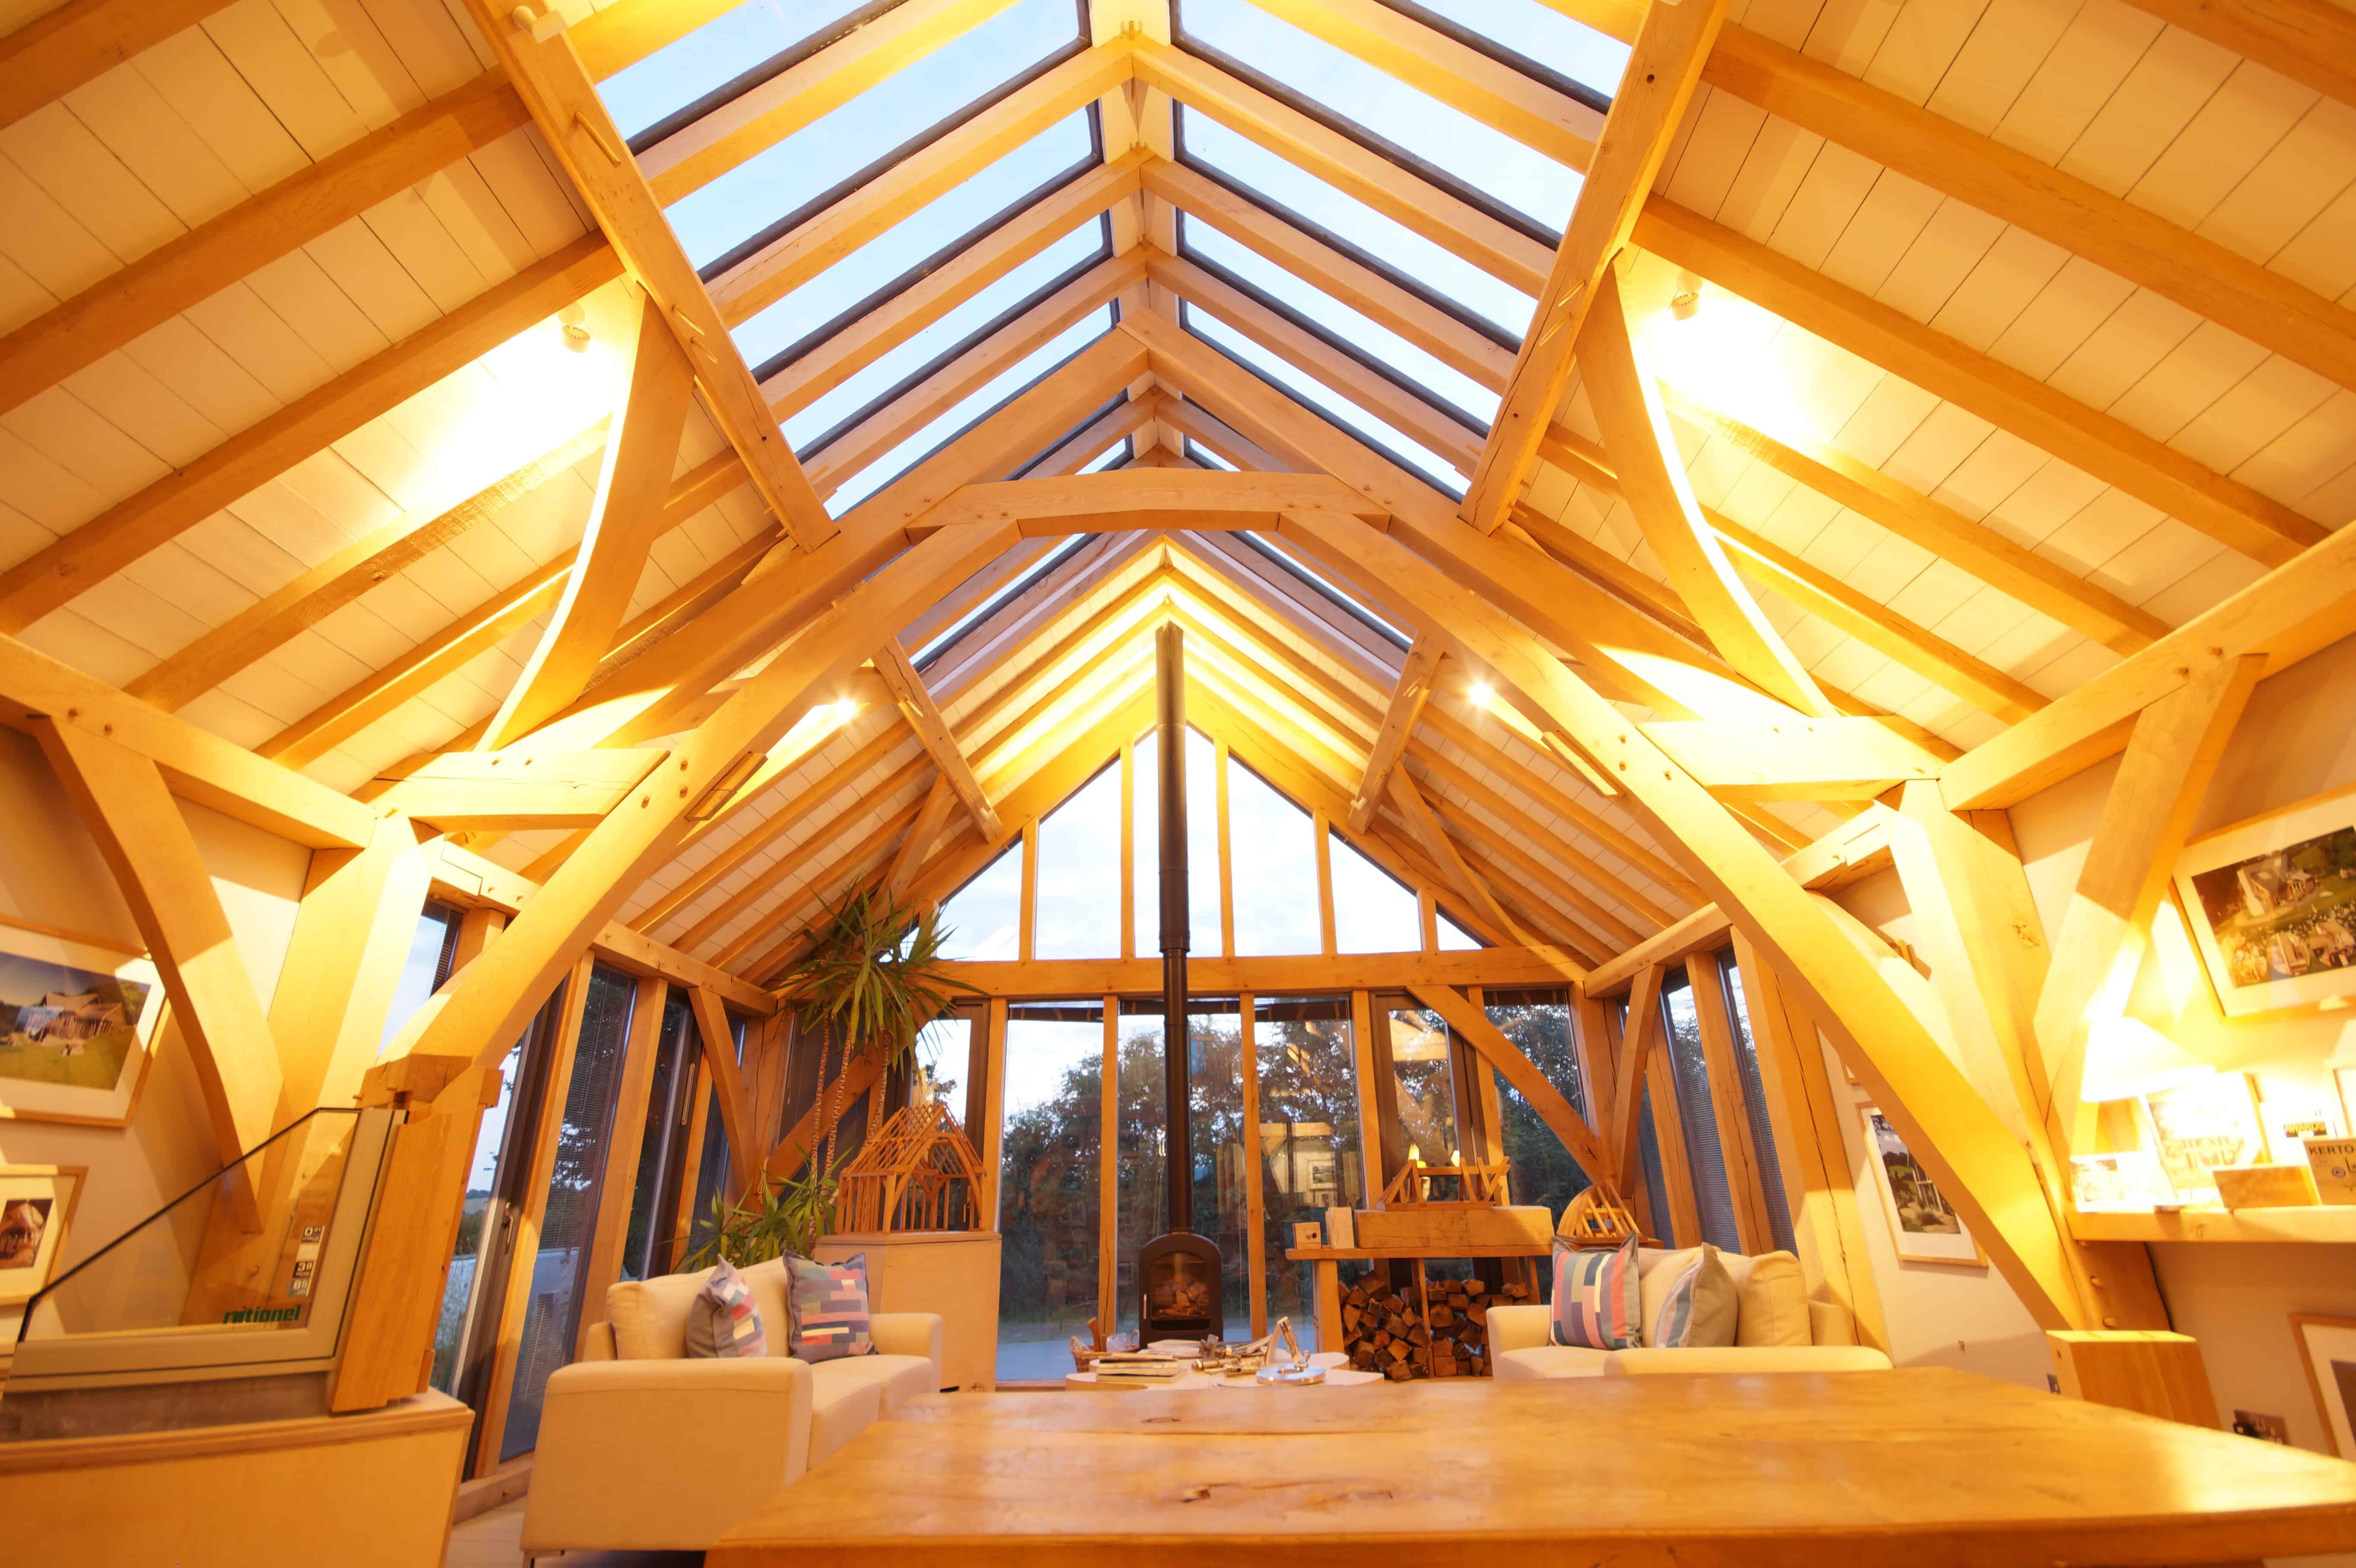 partners - Carpenter oak show barn